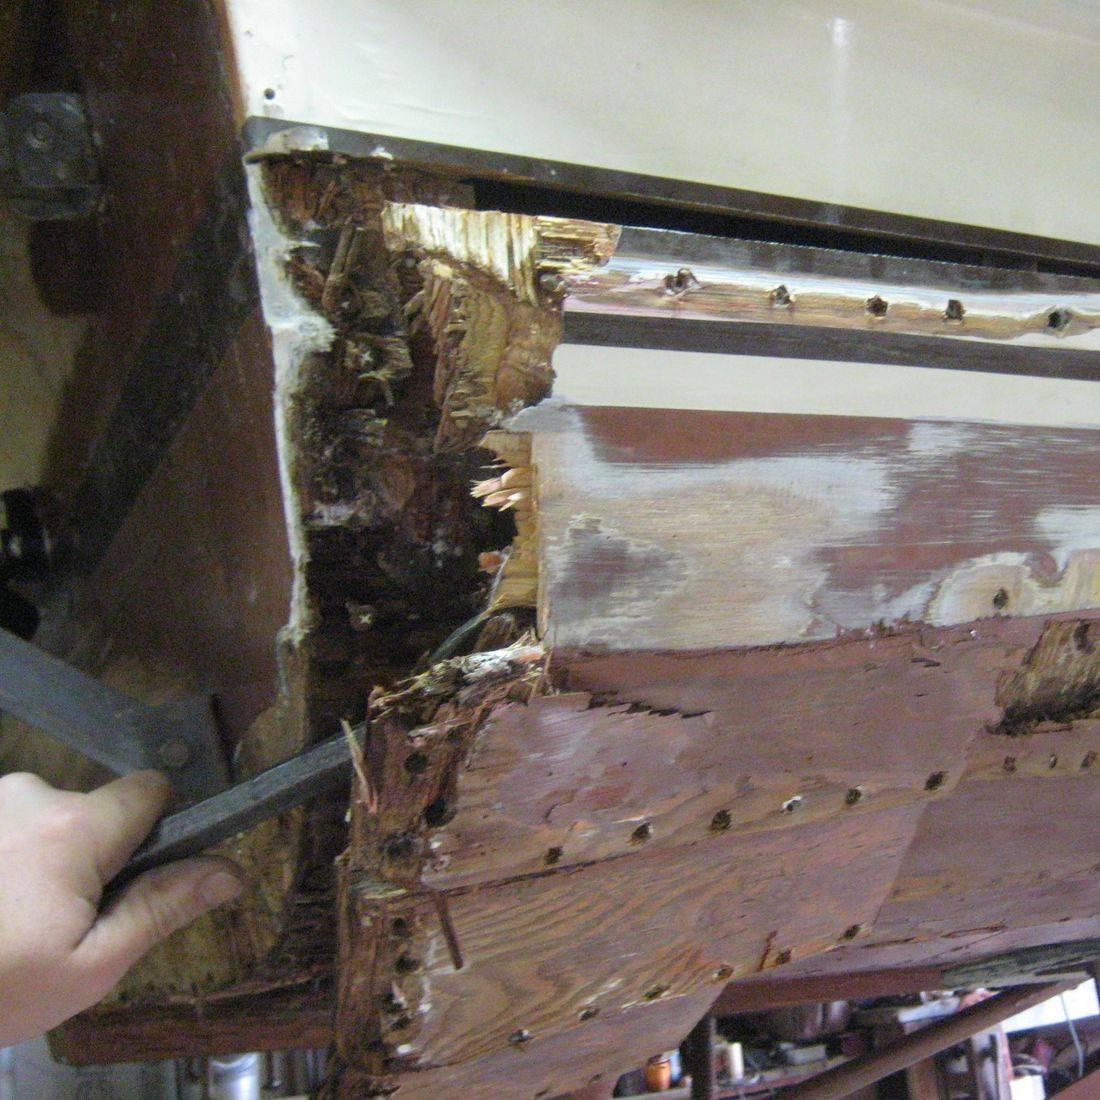 Bergersen Boat Co. fixing rot